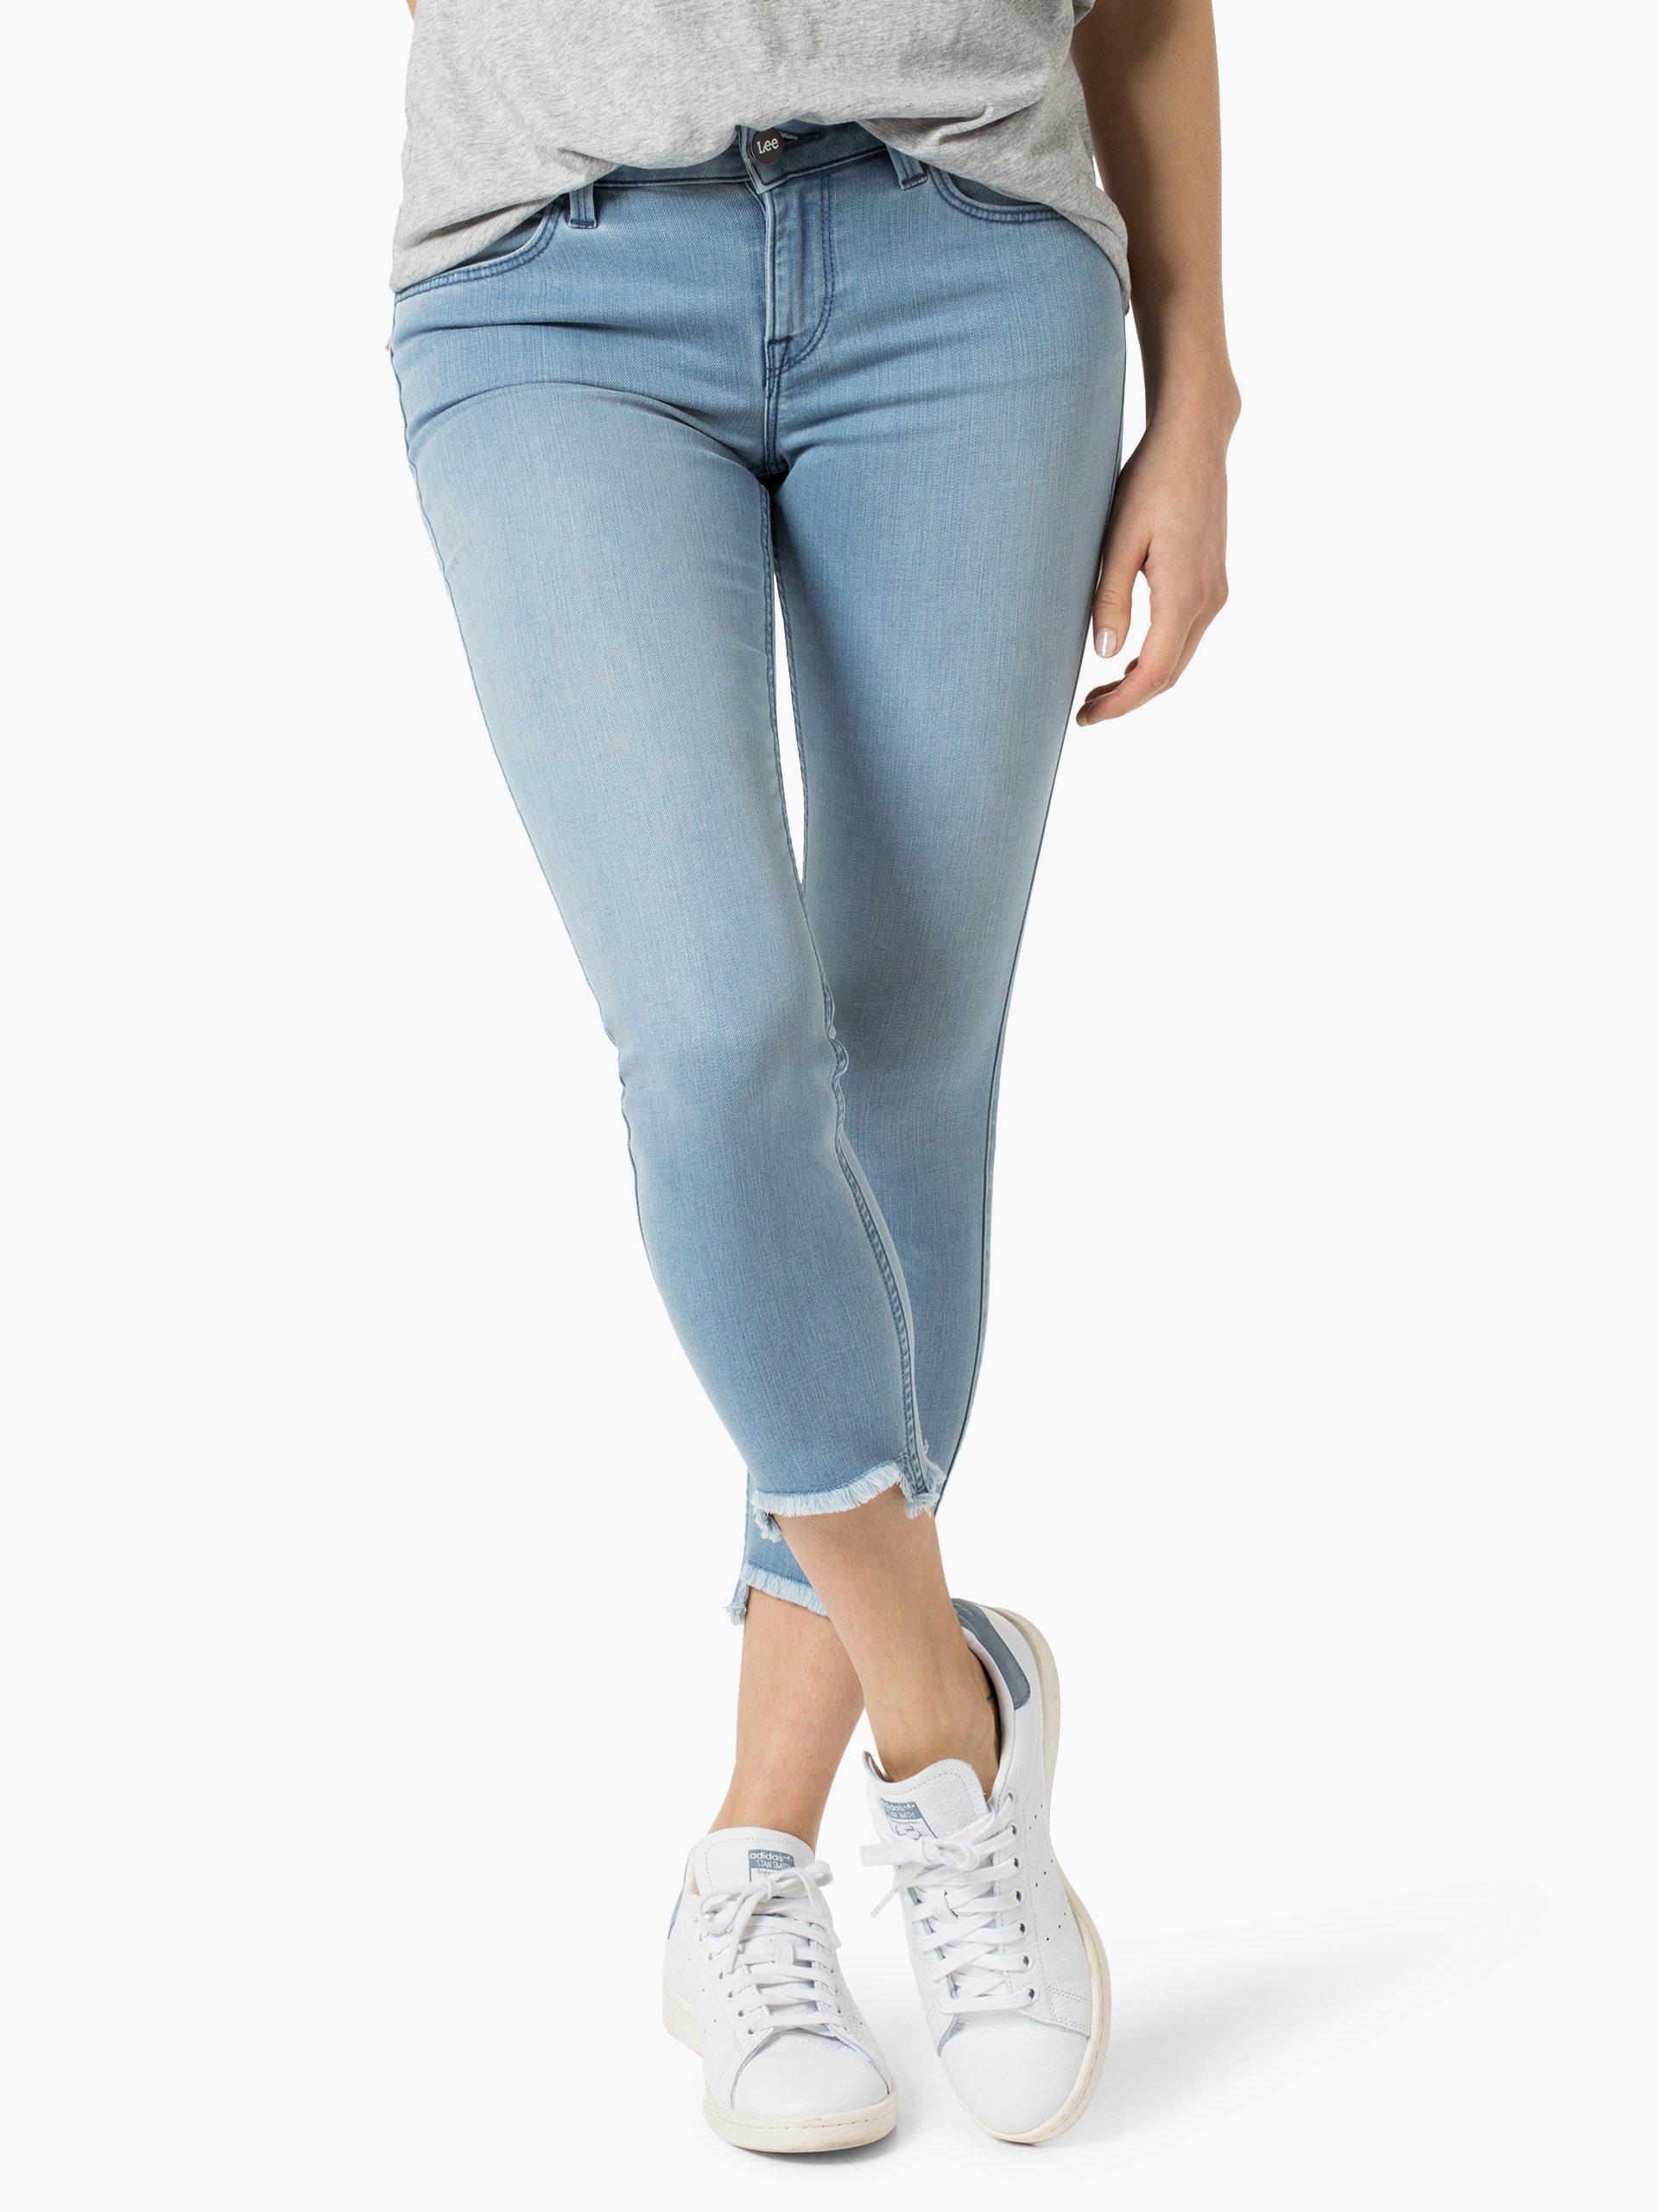 lee damen jeans scarlett hellblau uni online kaufen. Black Bedroom Furniture Sets. Home Design Ideas